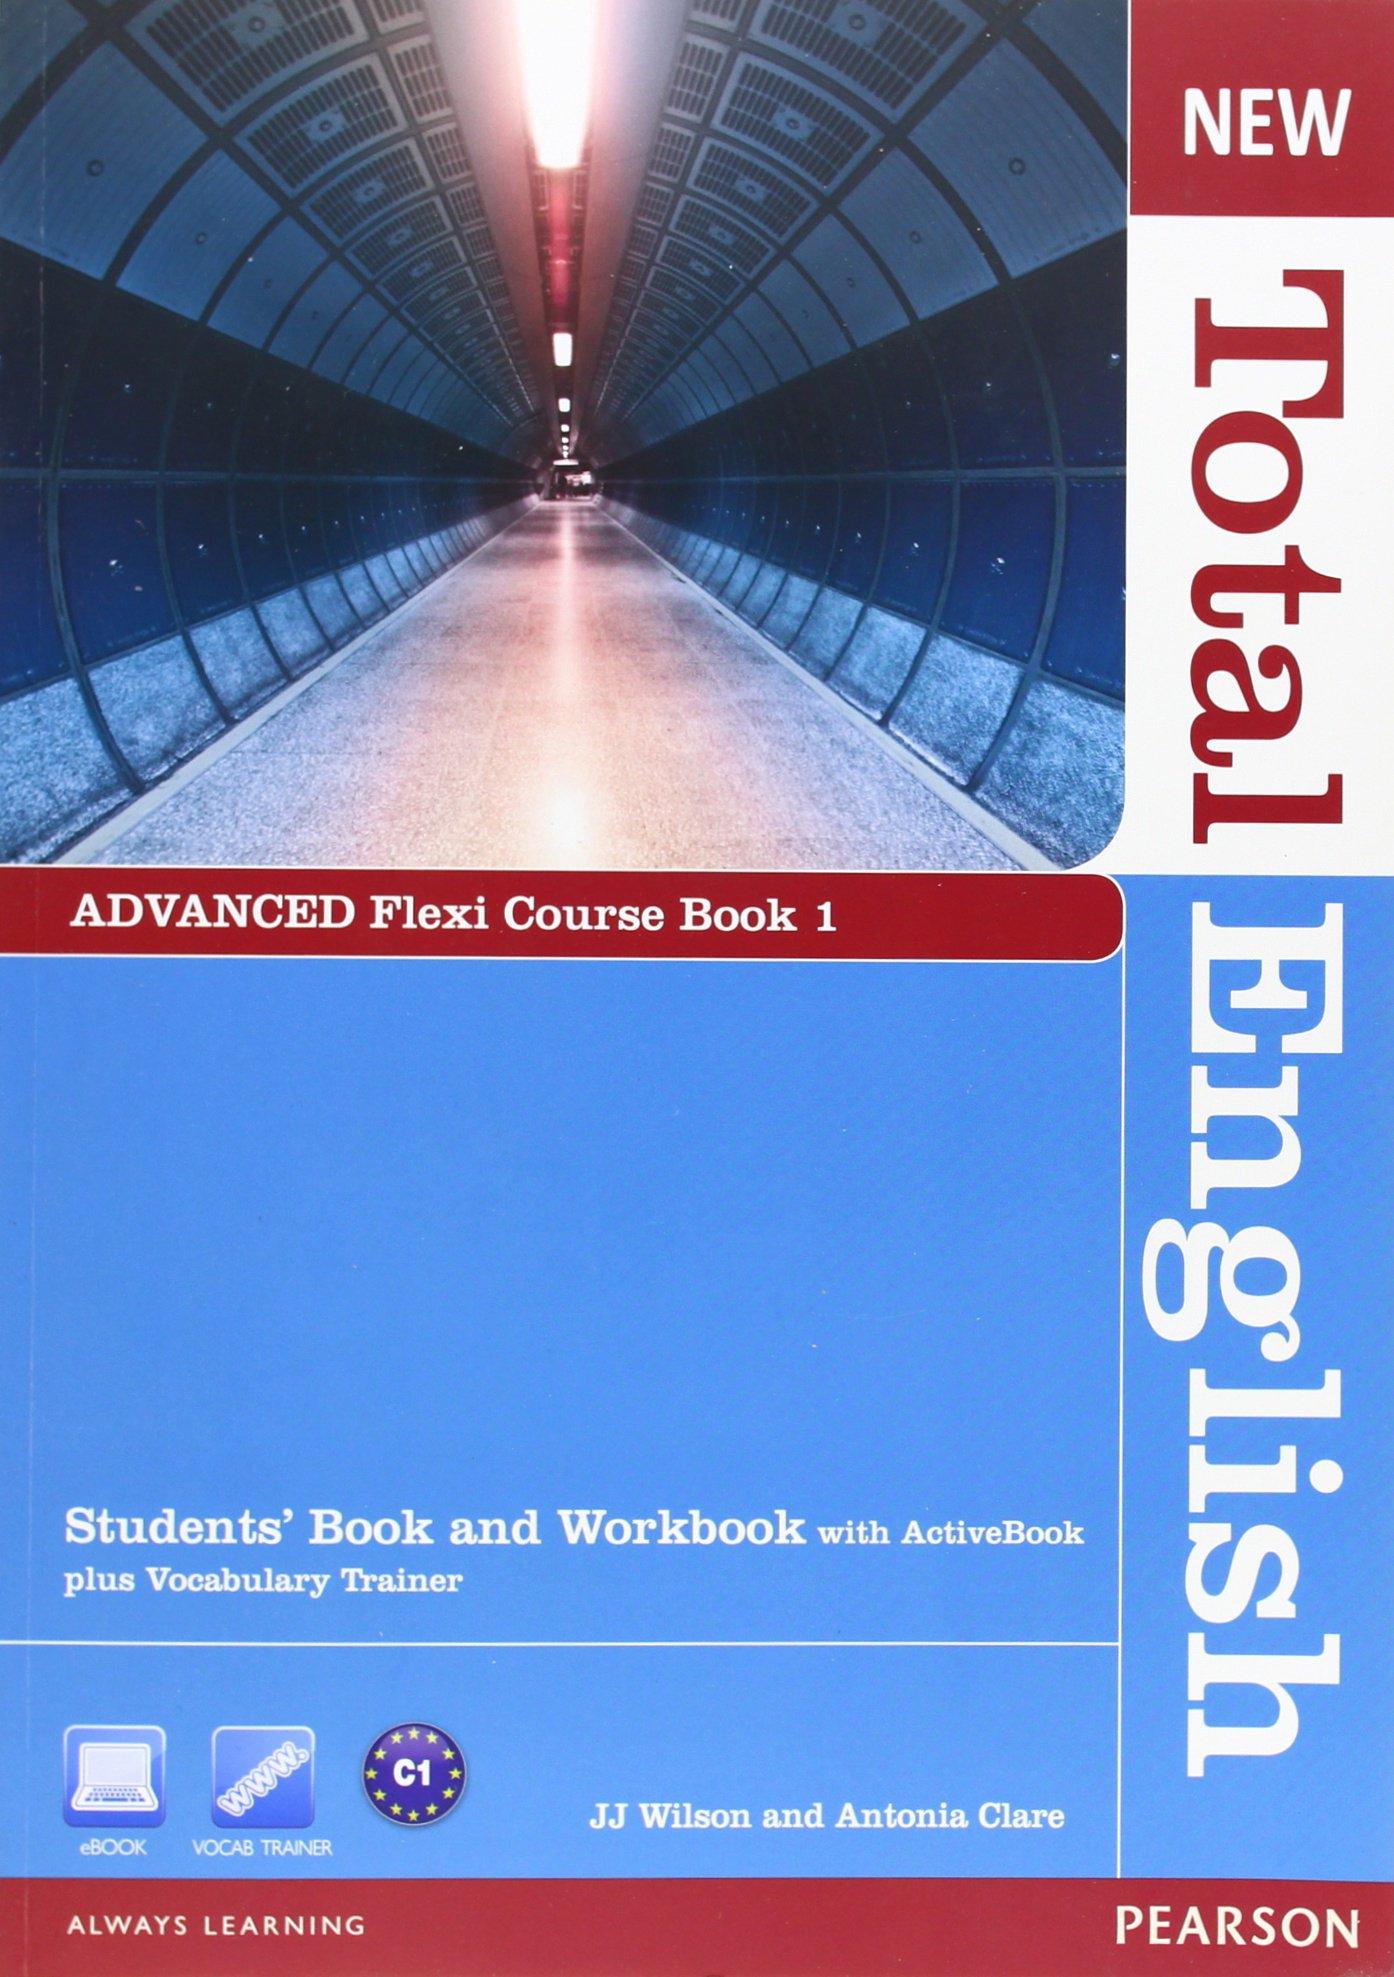 New Total English Advanced. Flexi Course Book 1